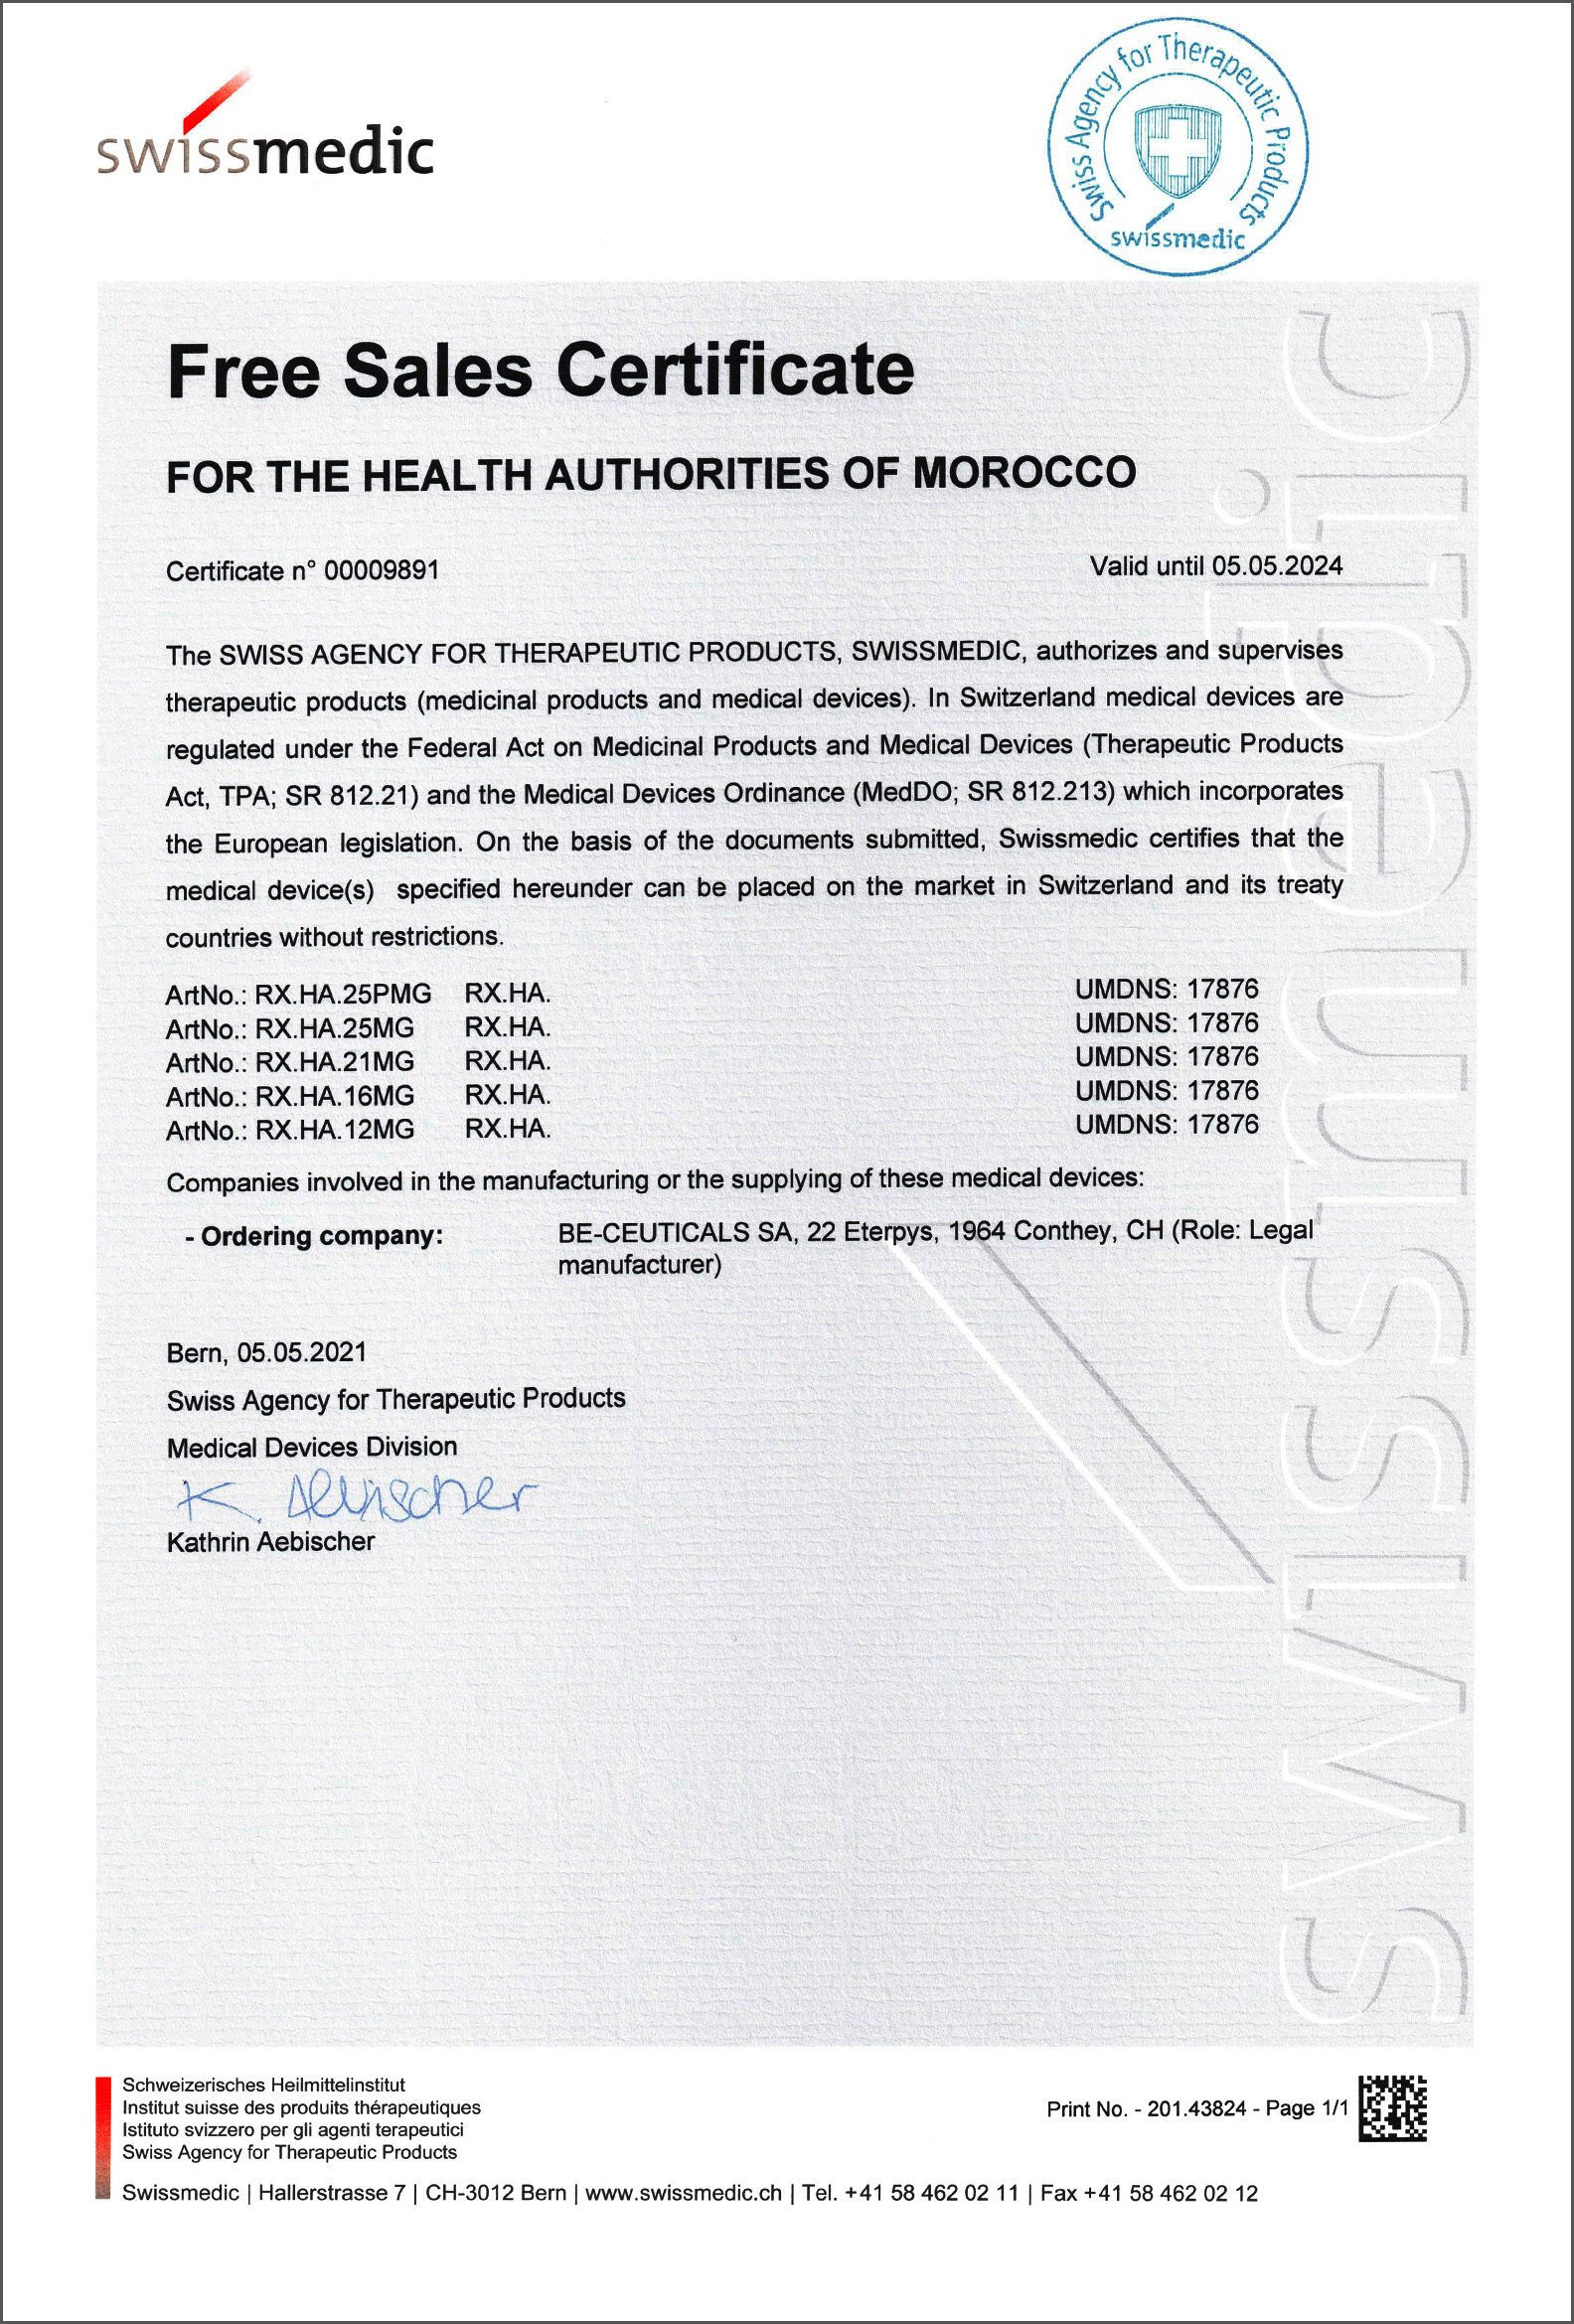 Swissmedic - Free Sales Certificate - Morocco